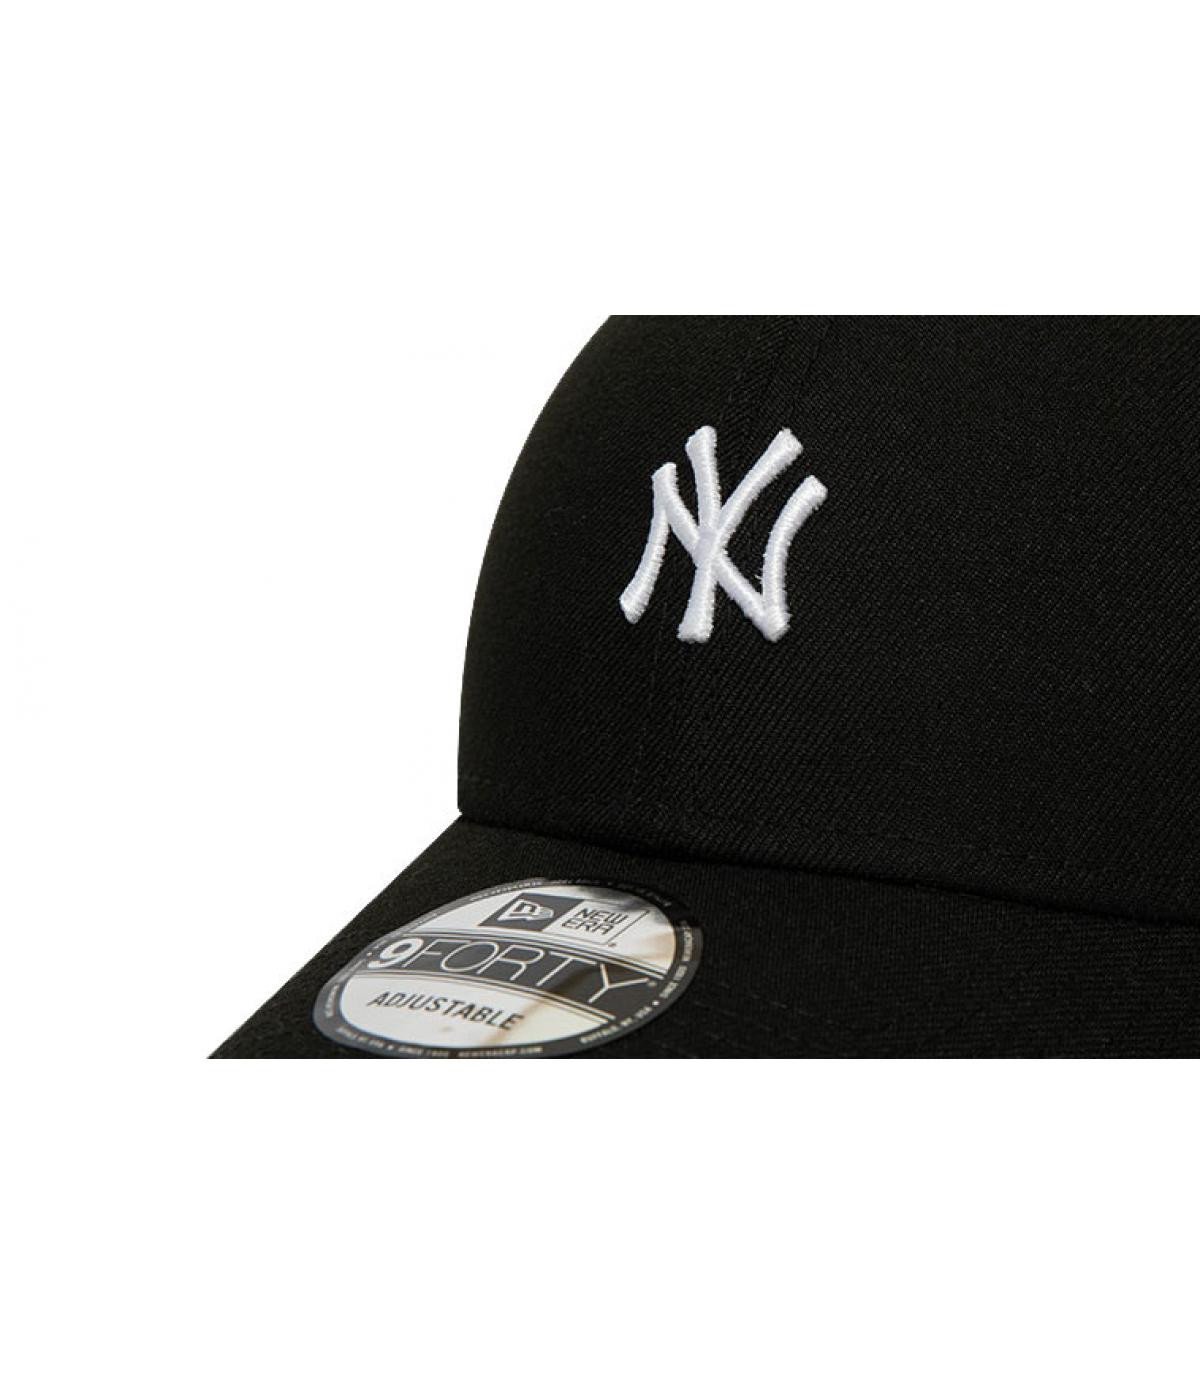 Details Cap MLB Tour NY 940 black - Abbildung 3